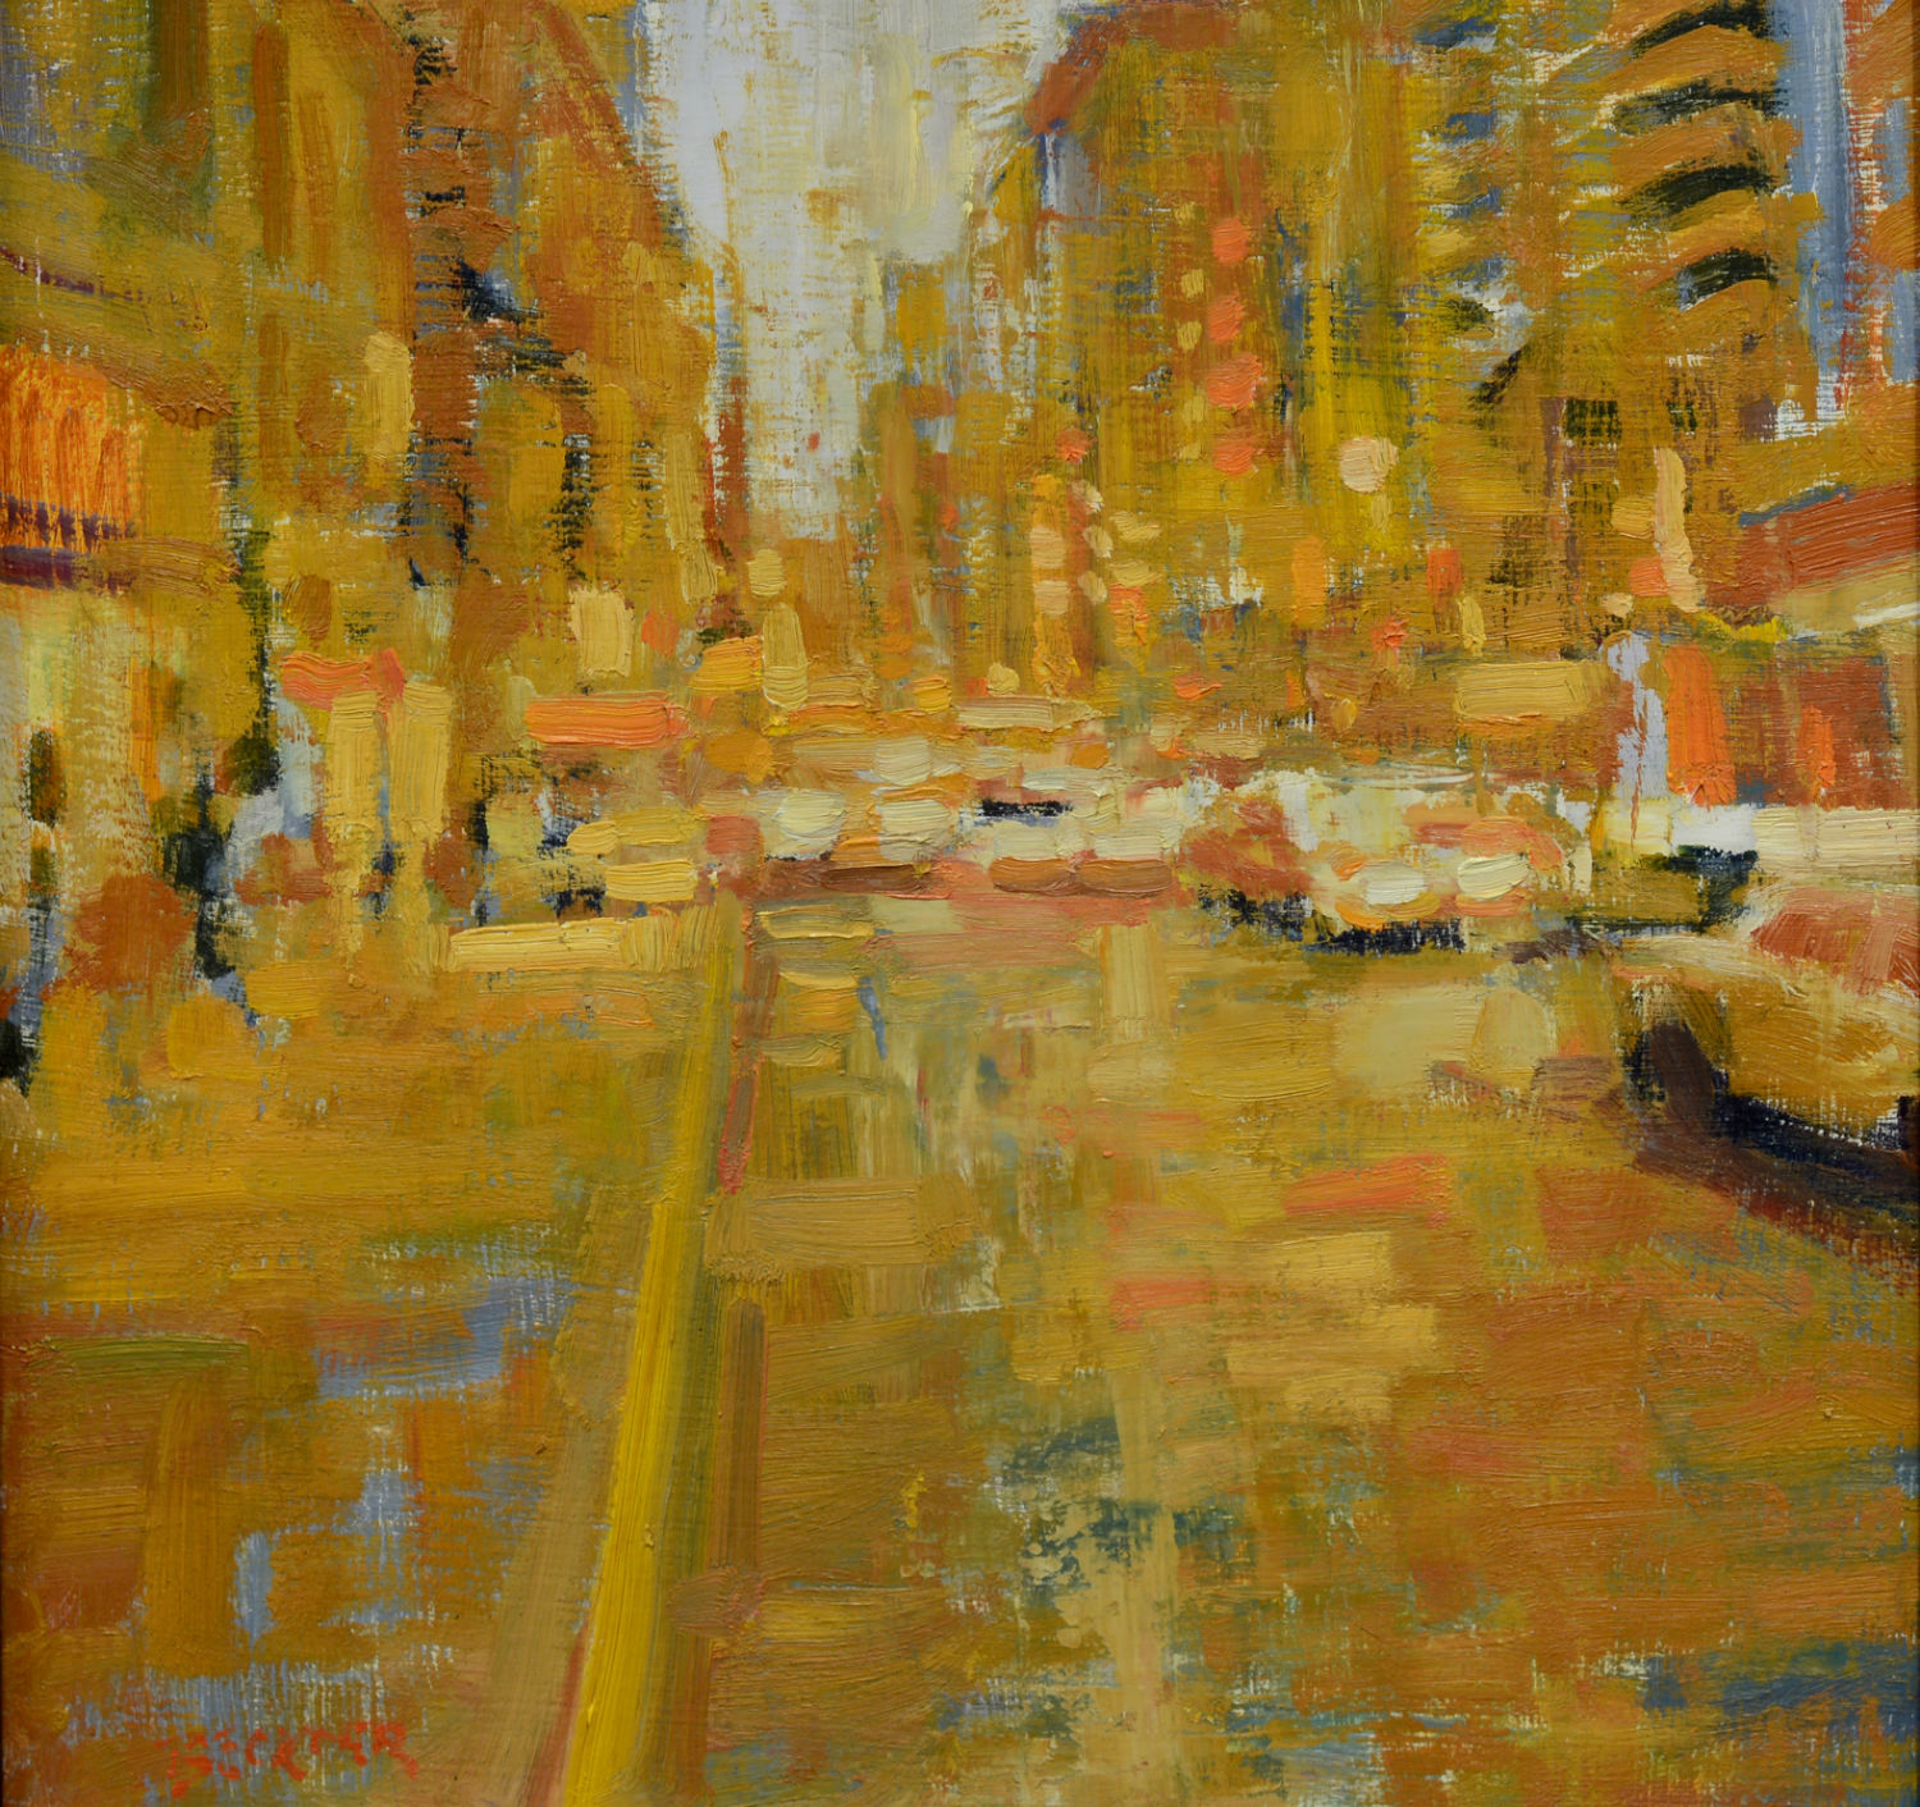 City in Yellow by Jim Beckner